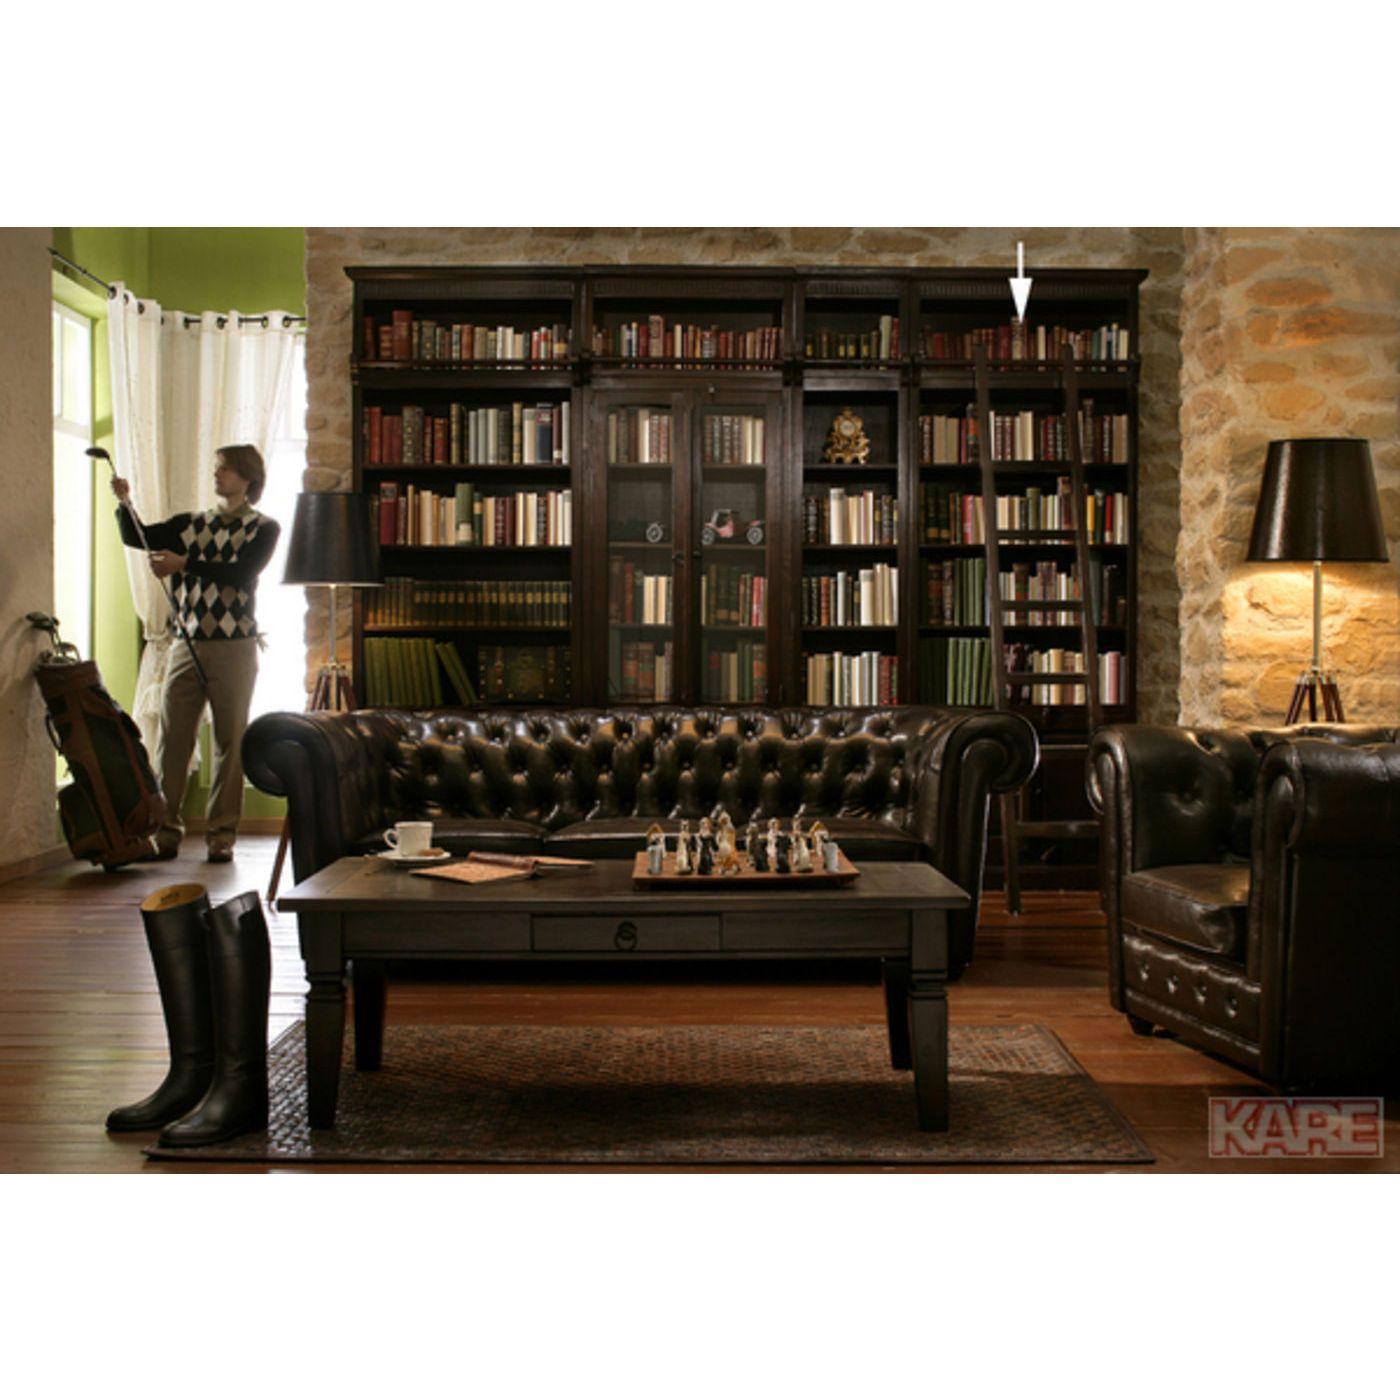 Cabana Bibliothek breit